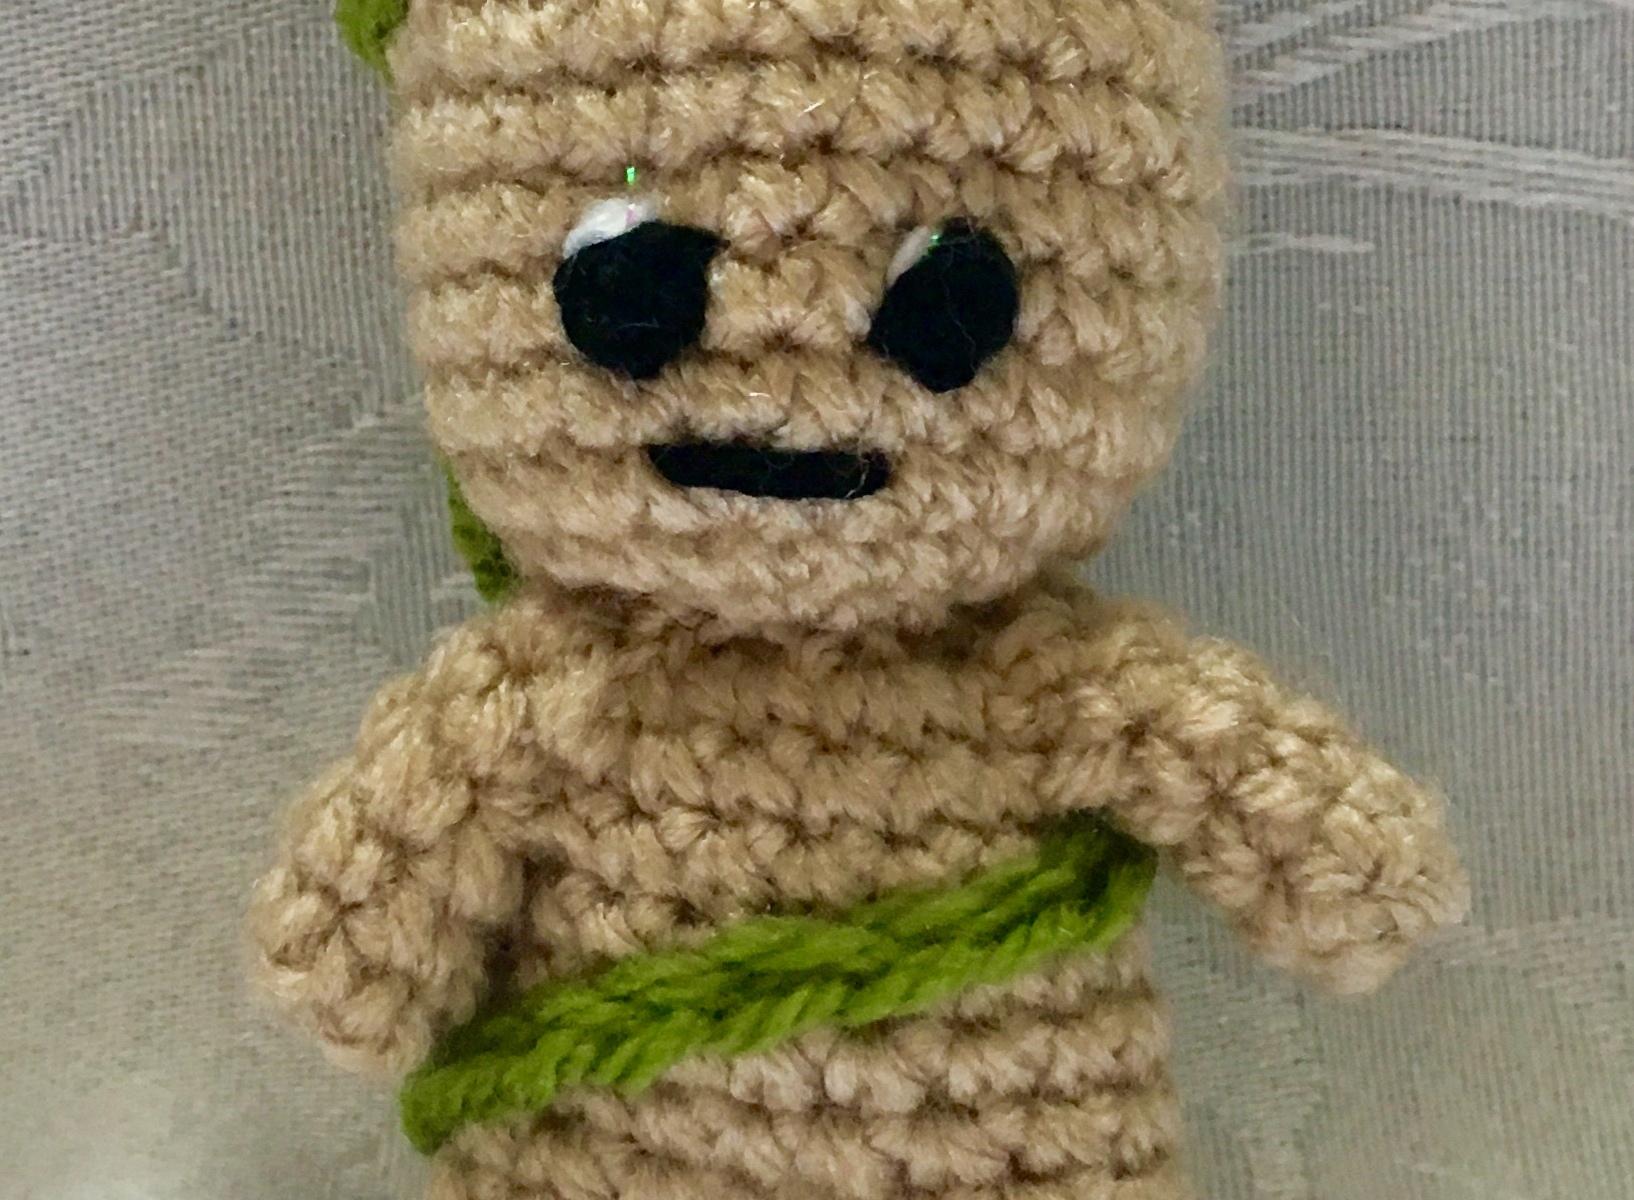 17 Best I am groot crochet patterns images in 2020 | Crochet ... | 1200x1634